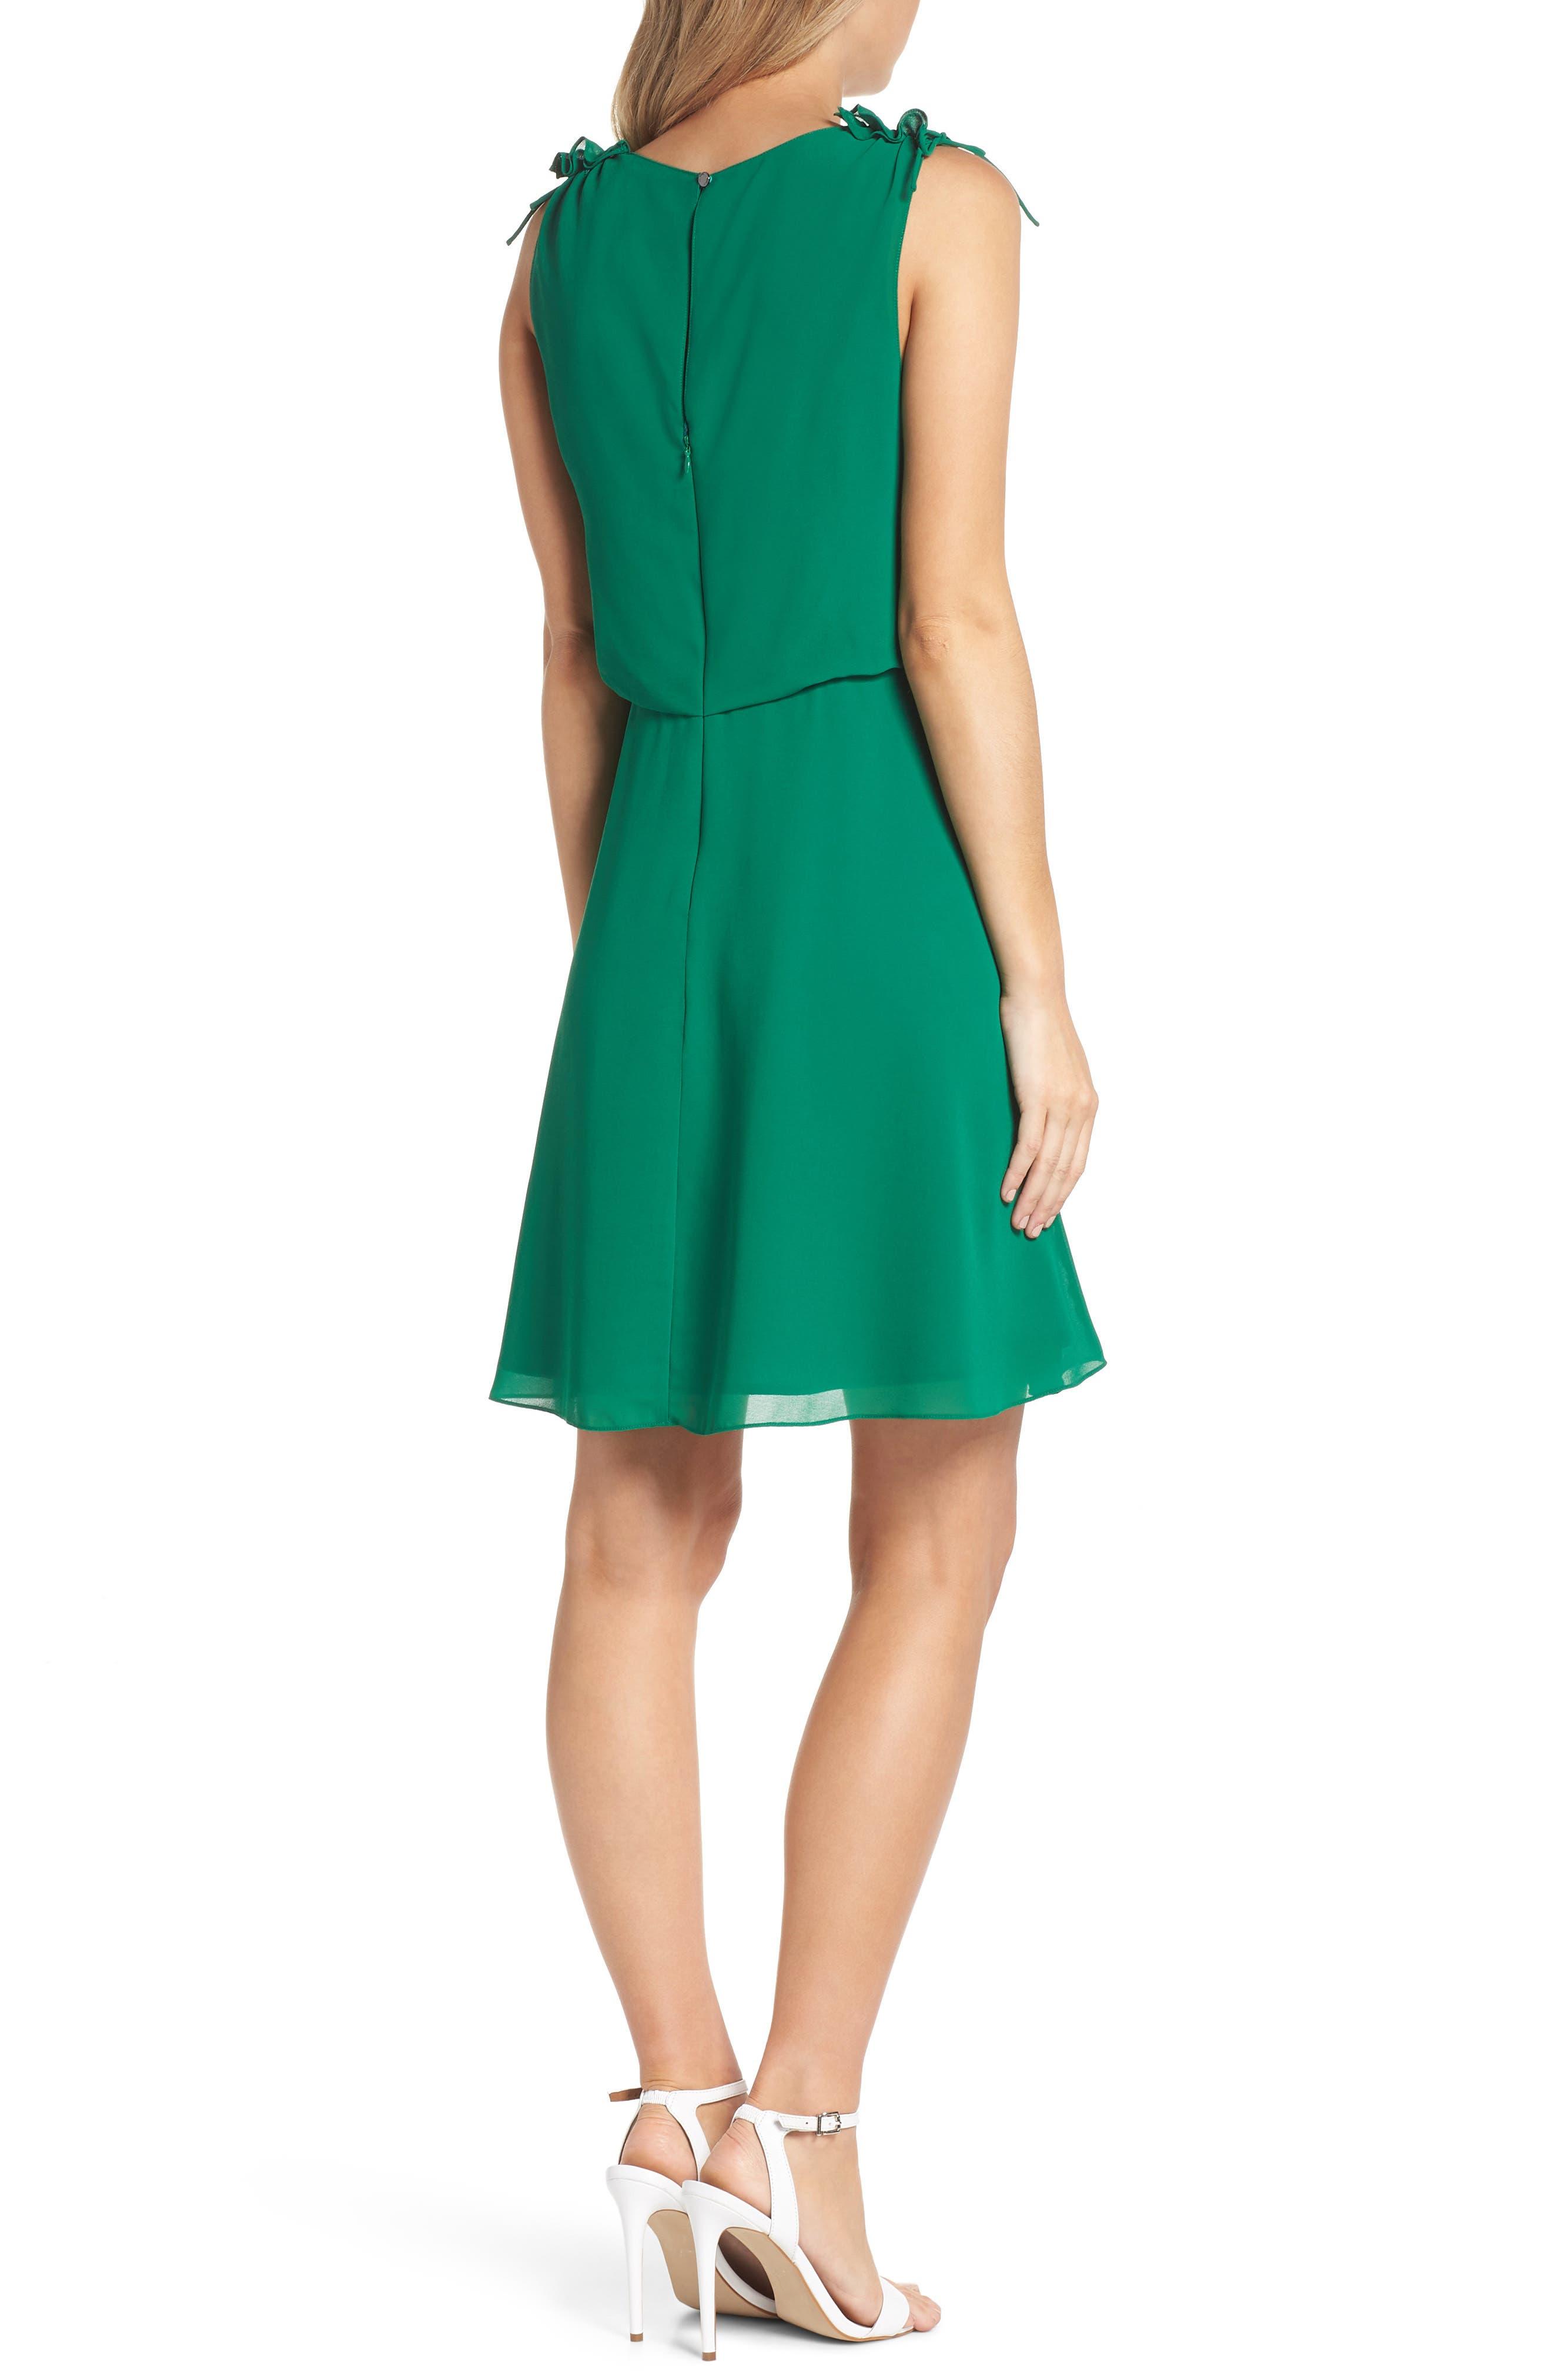 Soufflé V-Neck Chiffon Dress,                             Alternate thumbnail 2, color,                             310